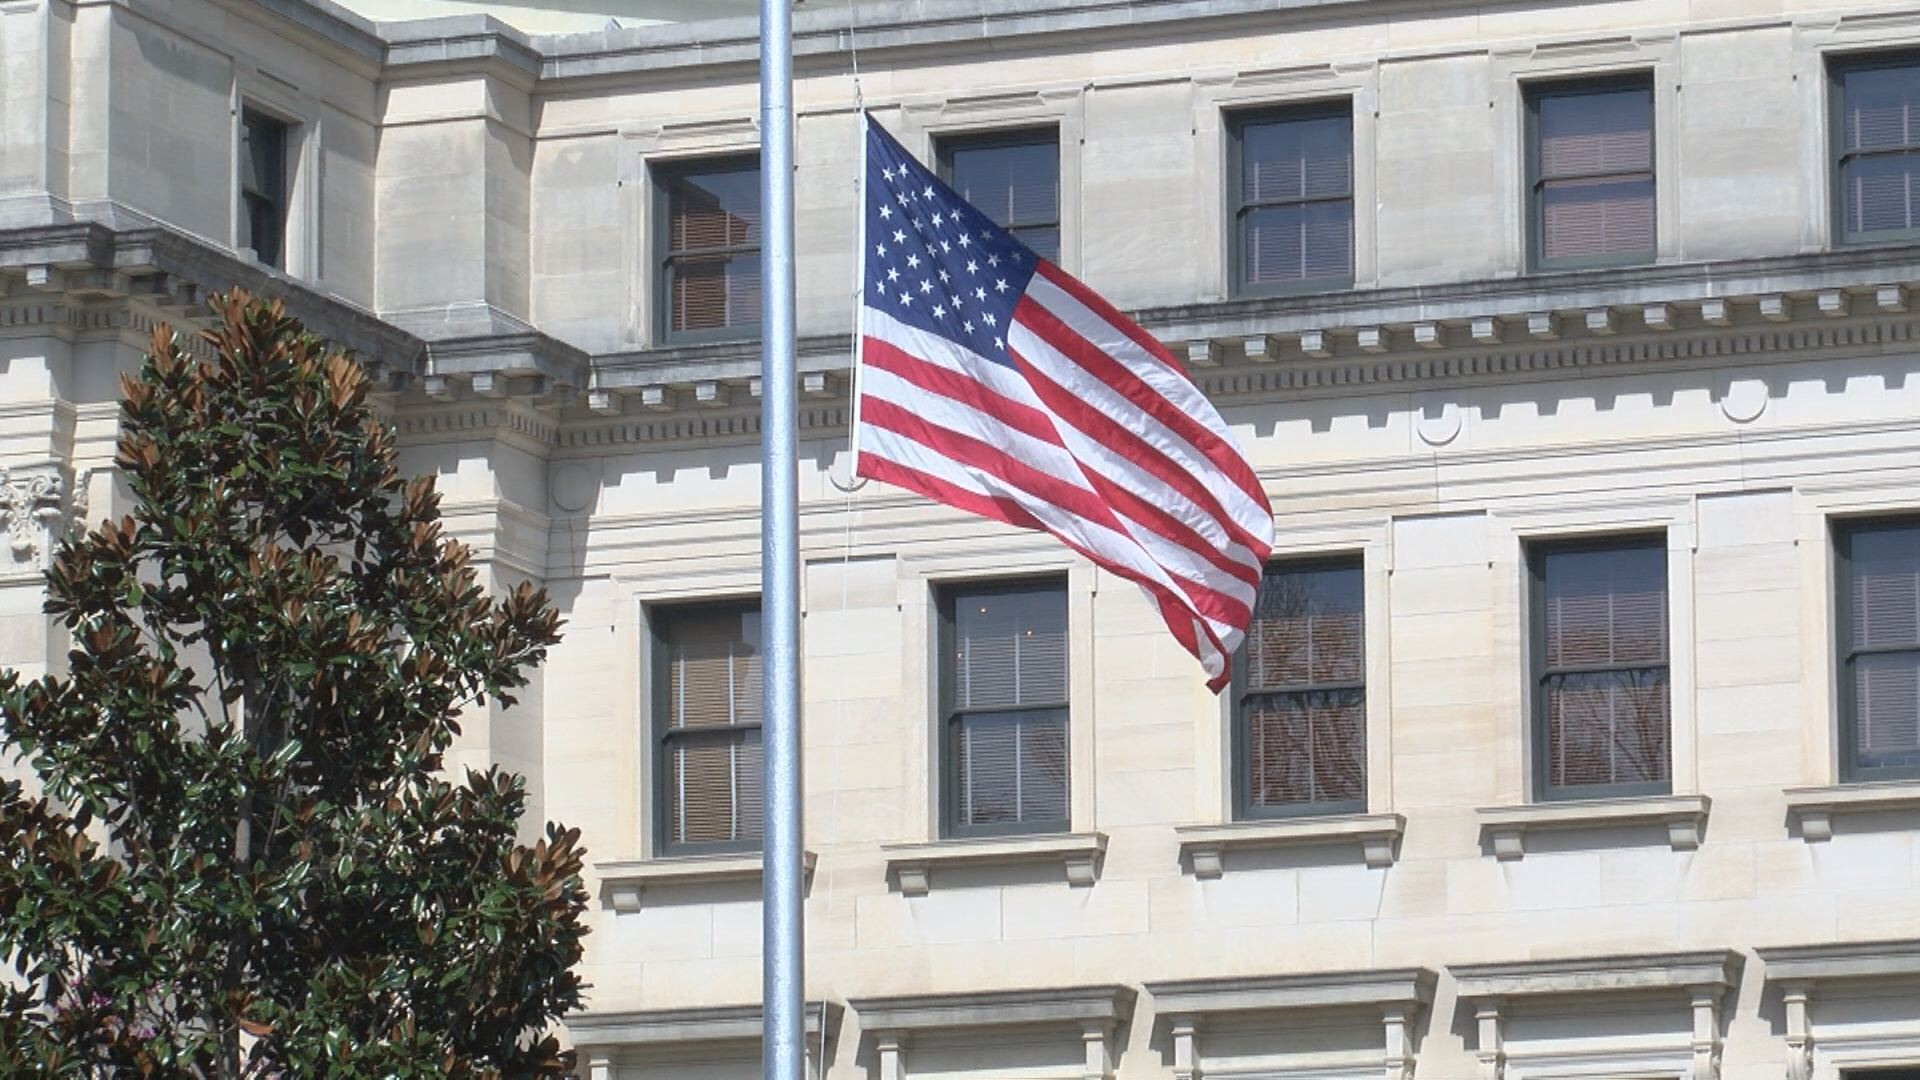 FLAG AT HALF STAFF_1518723518469.jpg.jpg